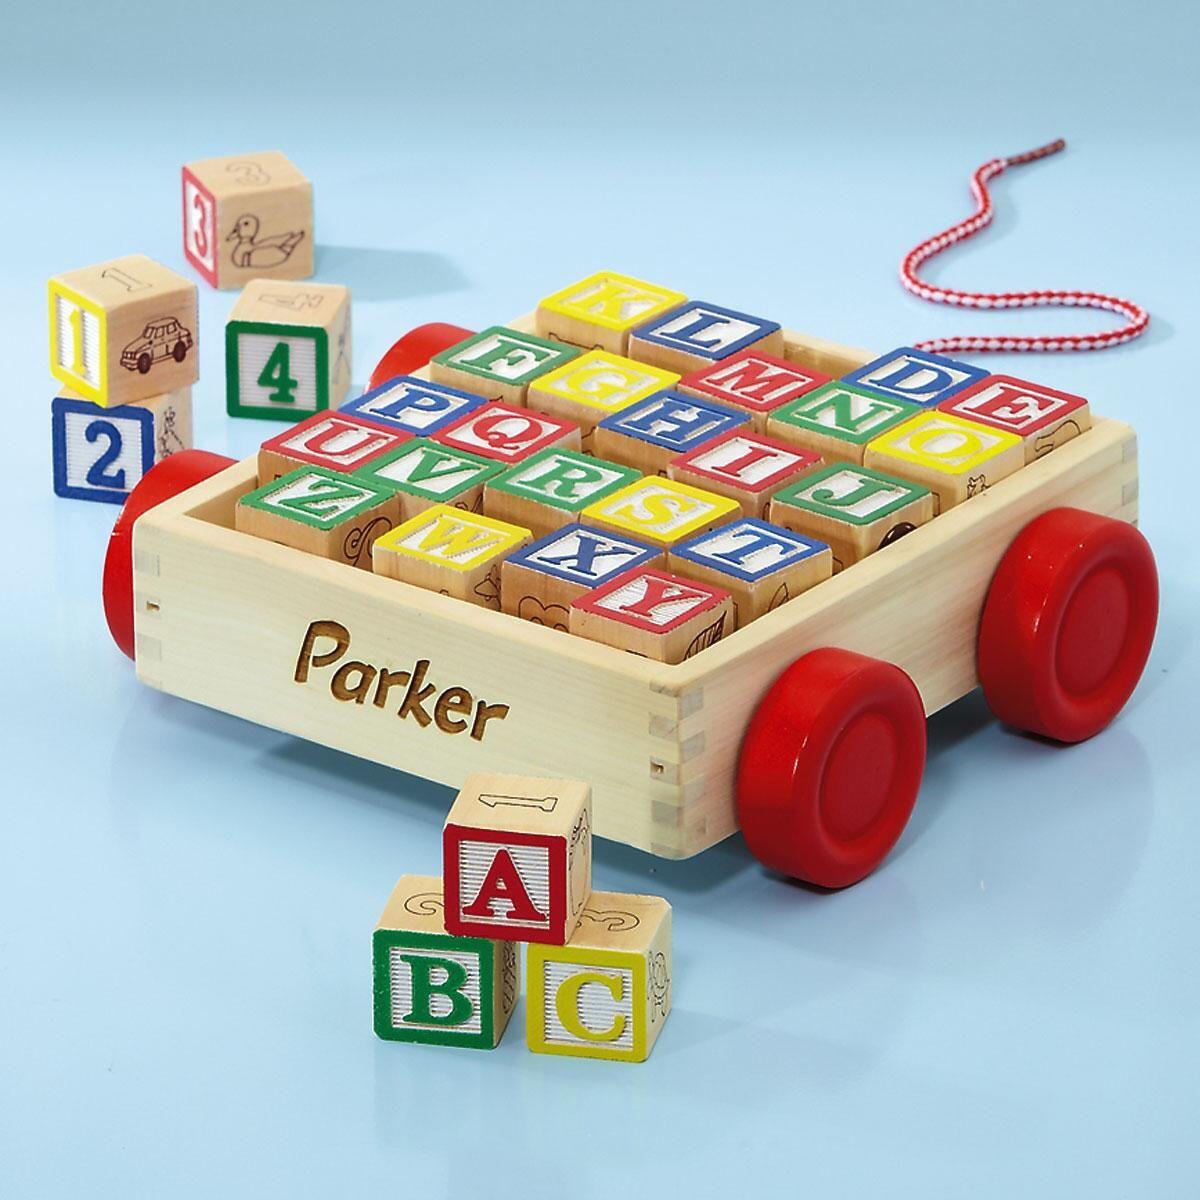 ABC Personalized Block Cart